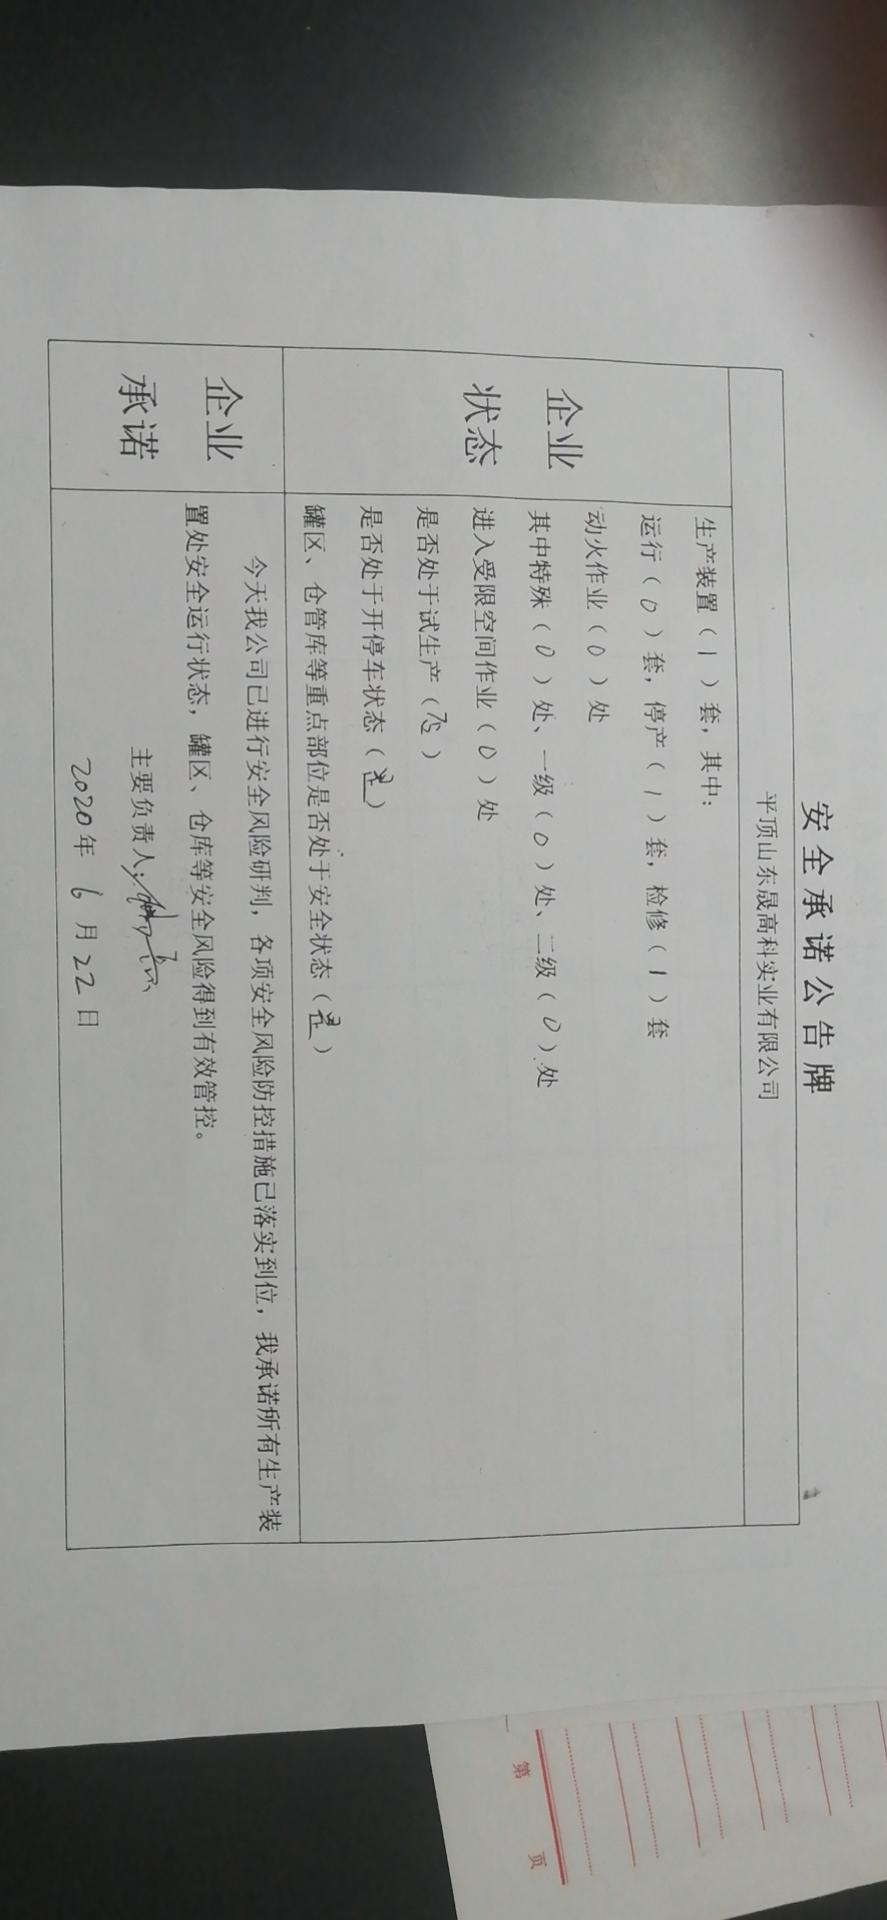 40b7e0cafde1c7f785d9e9acb22aa76.jpg